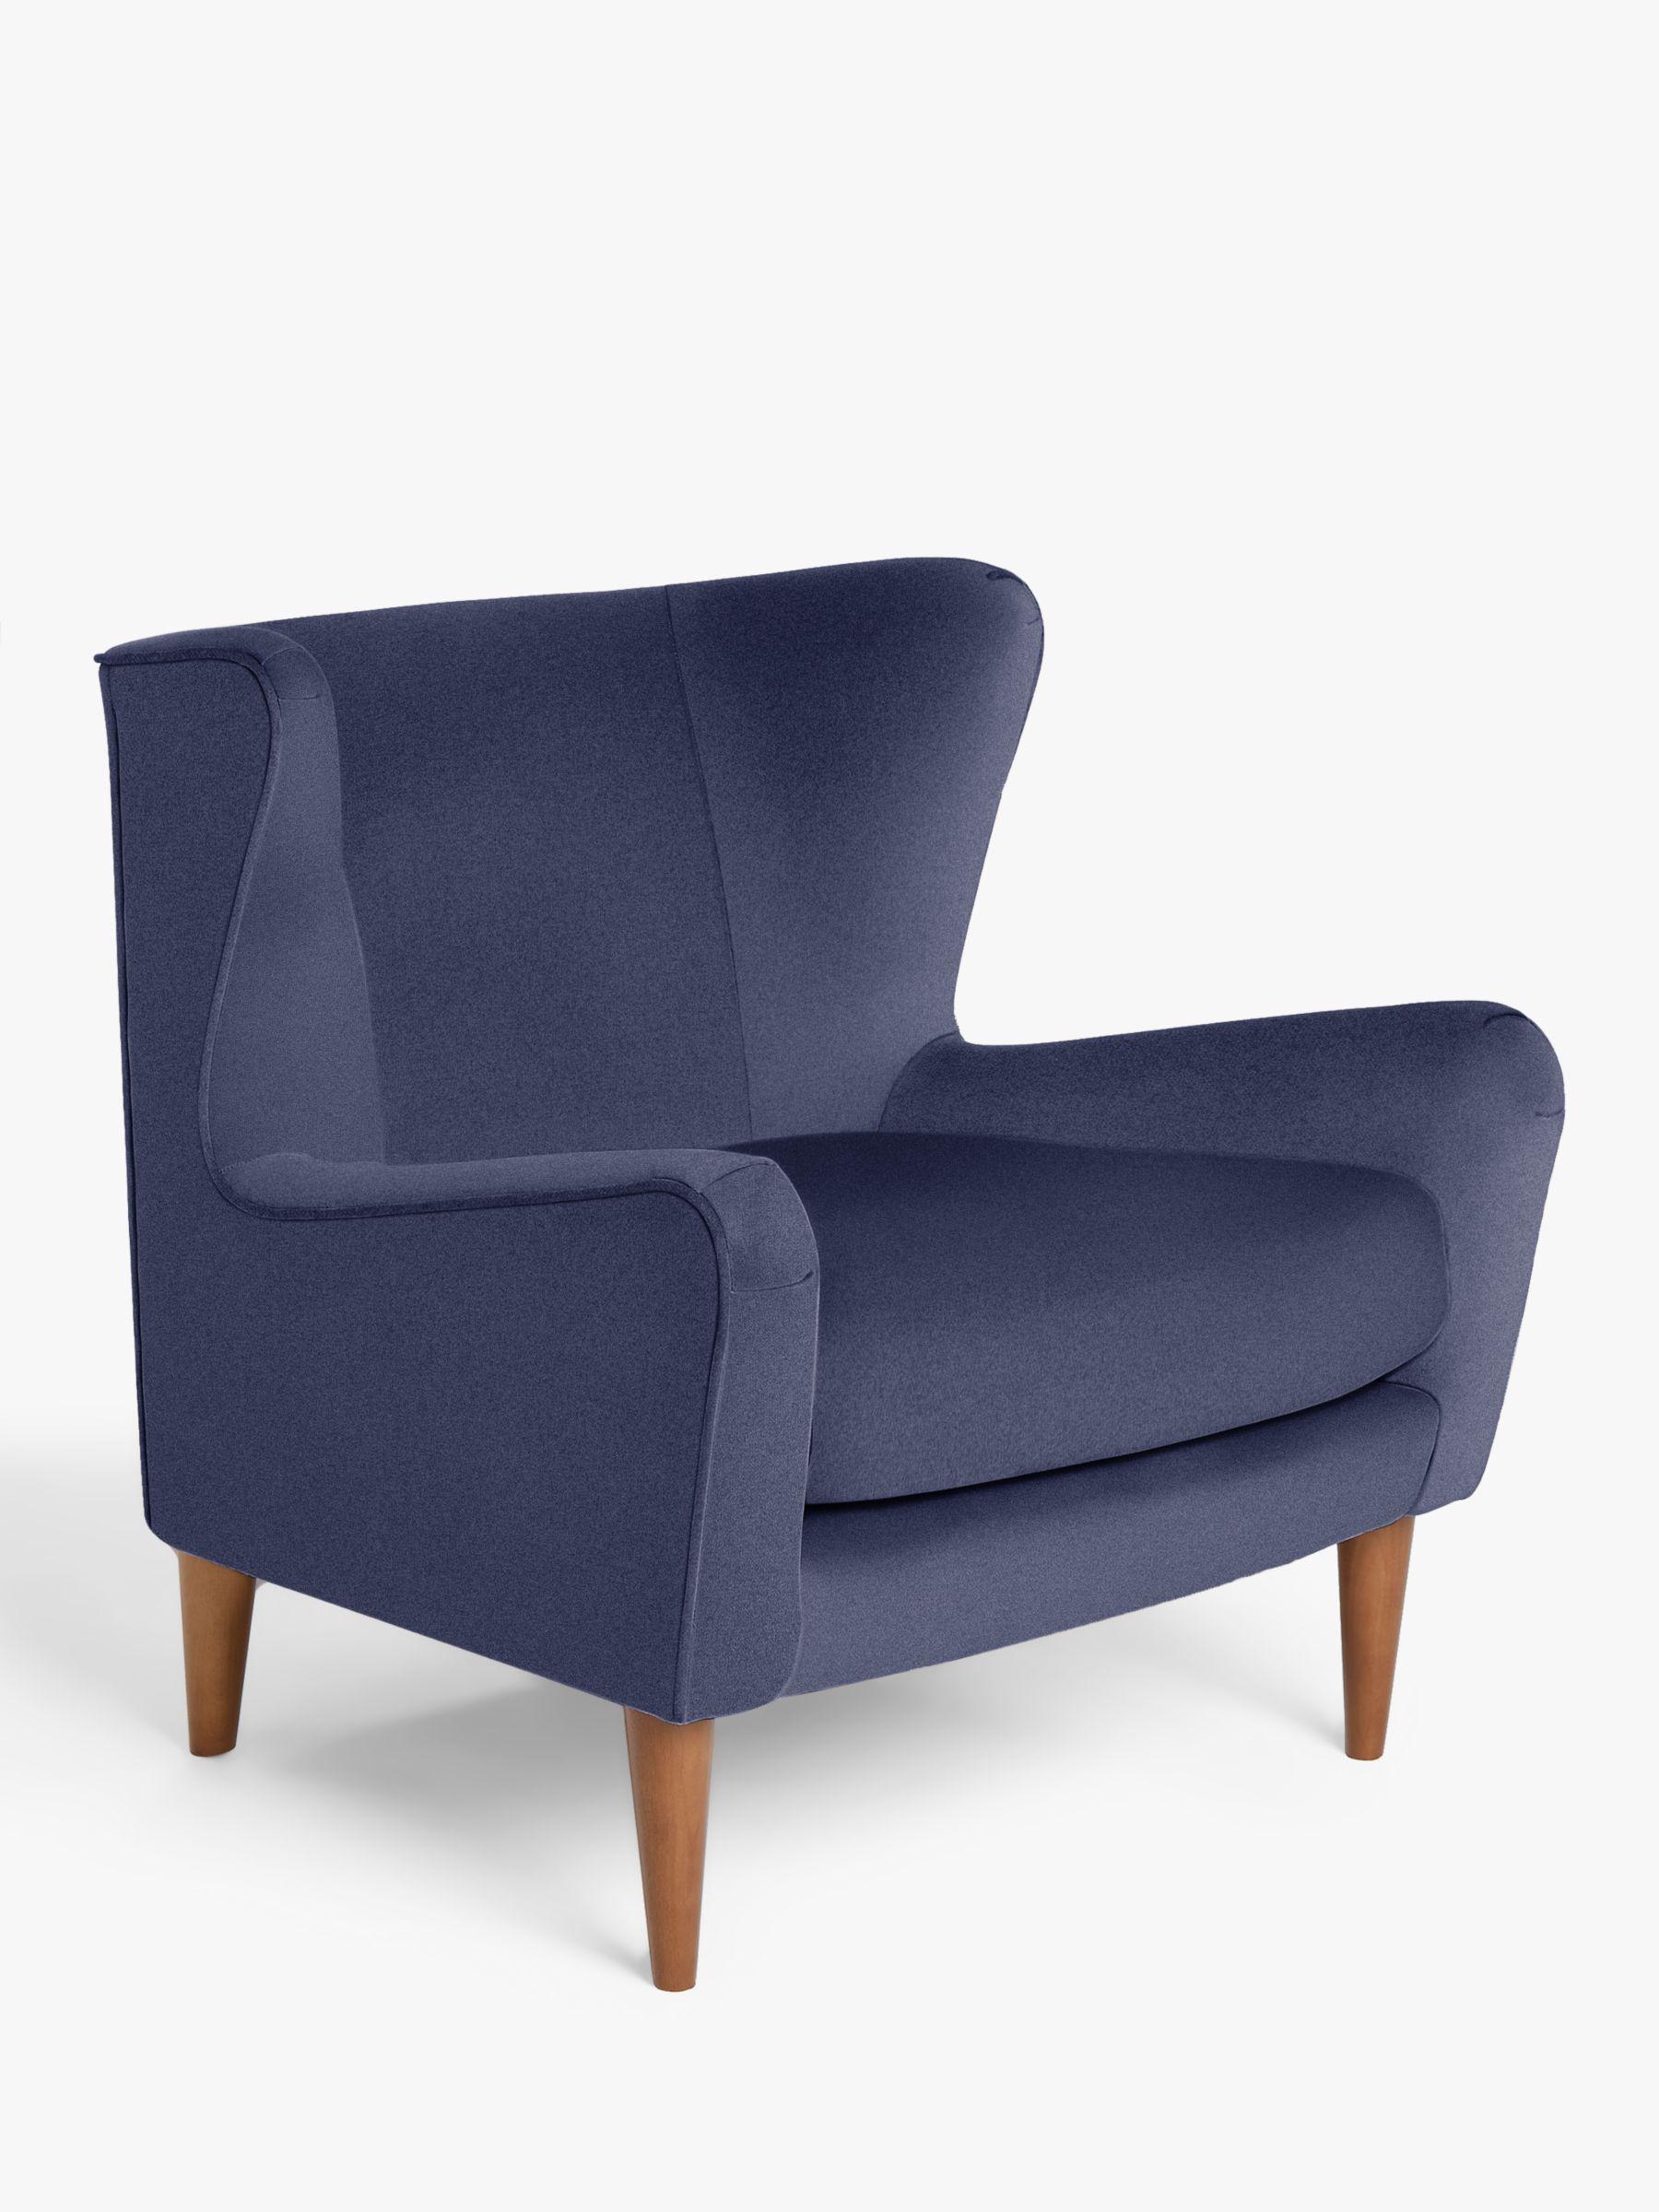 John Lewis & Partners + Swoon Keats Wingback Armchair